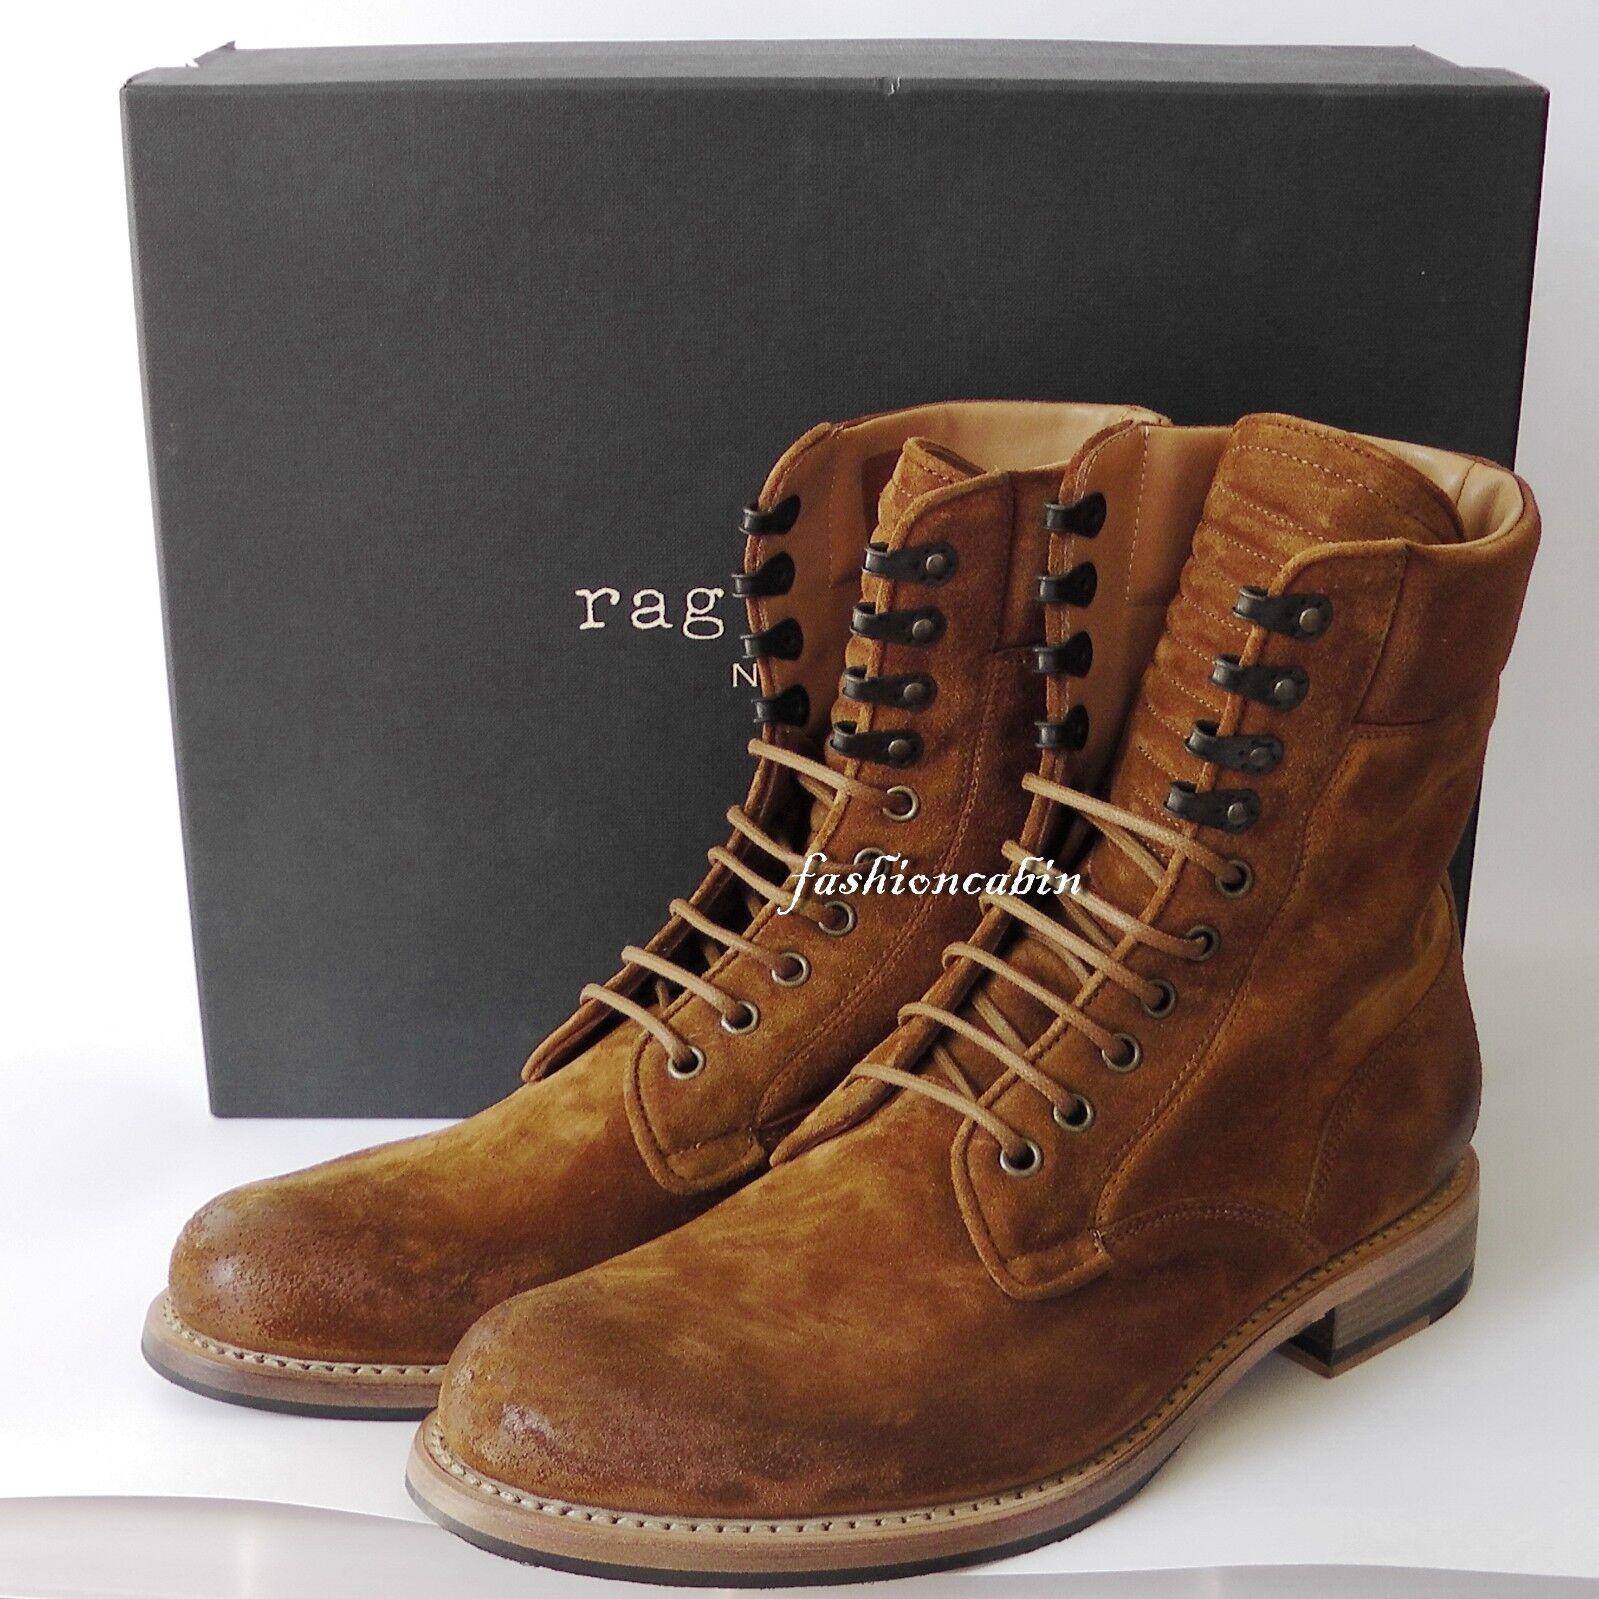 New with Box Rag & Bone Spencer Suede Military Boot Shoe, COGNAC, EU43, MSRP 595